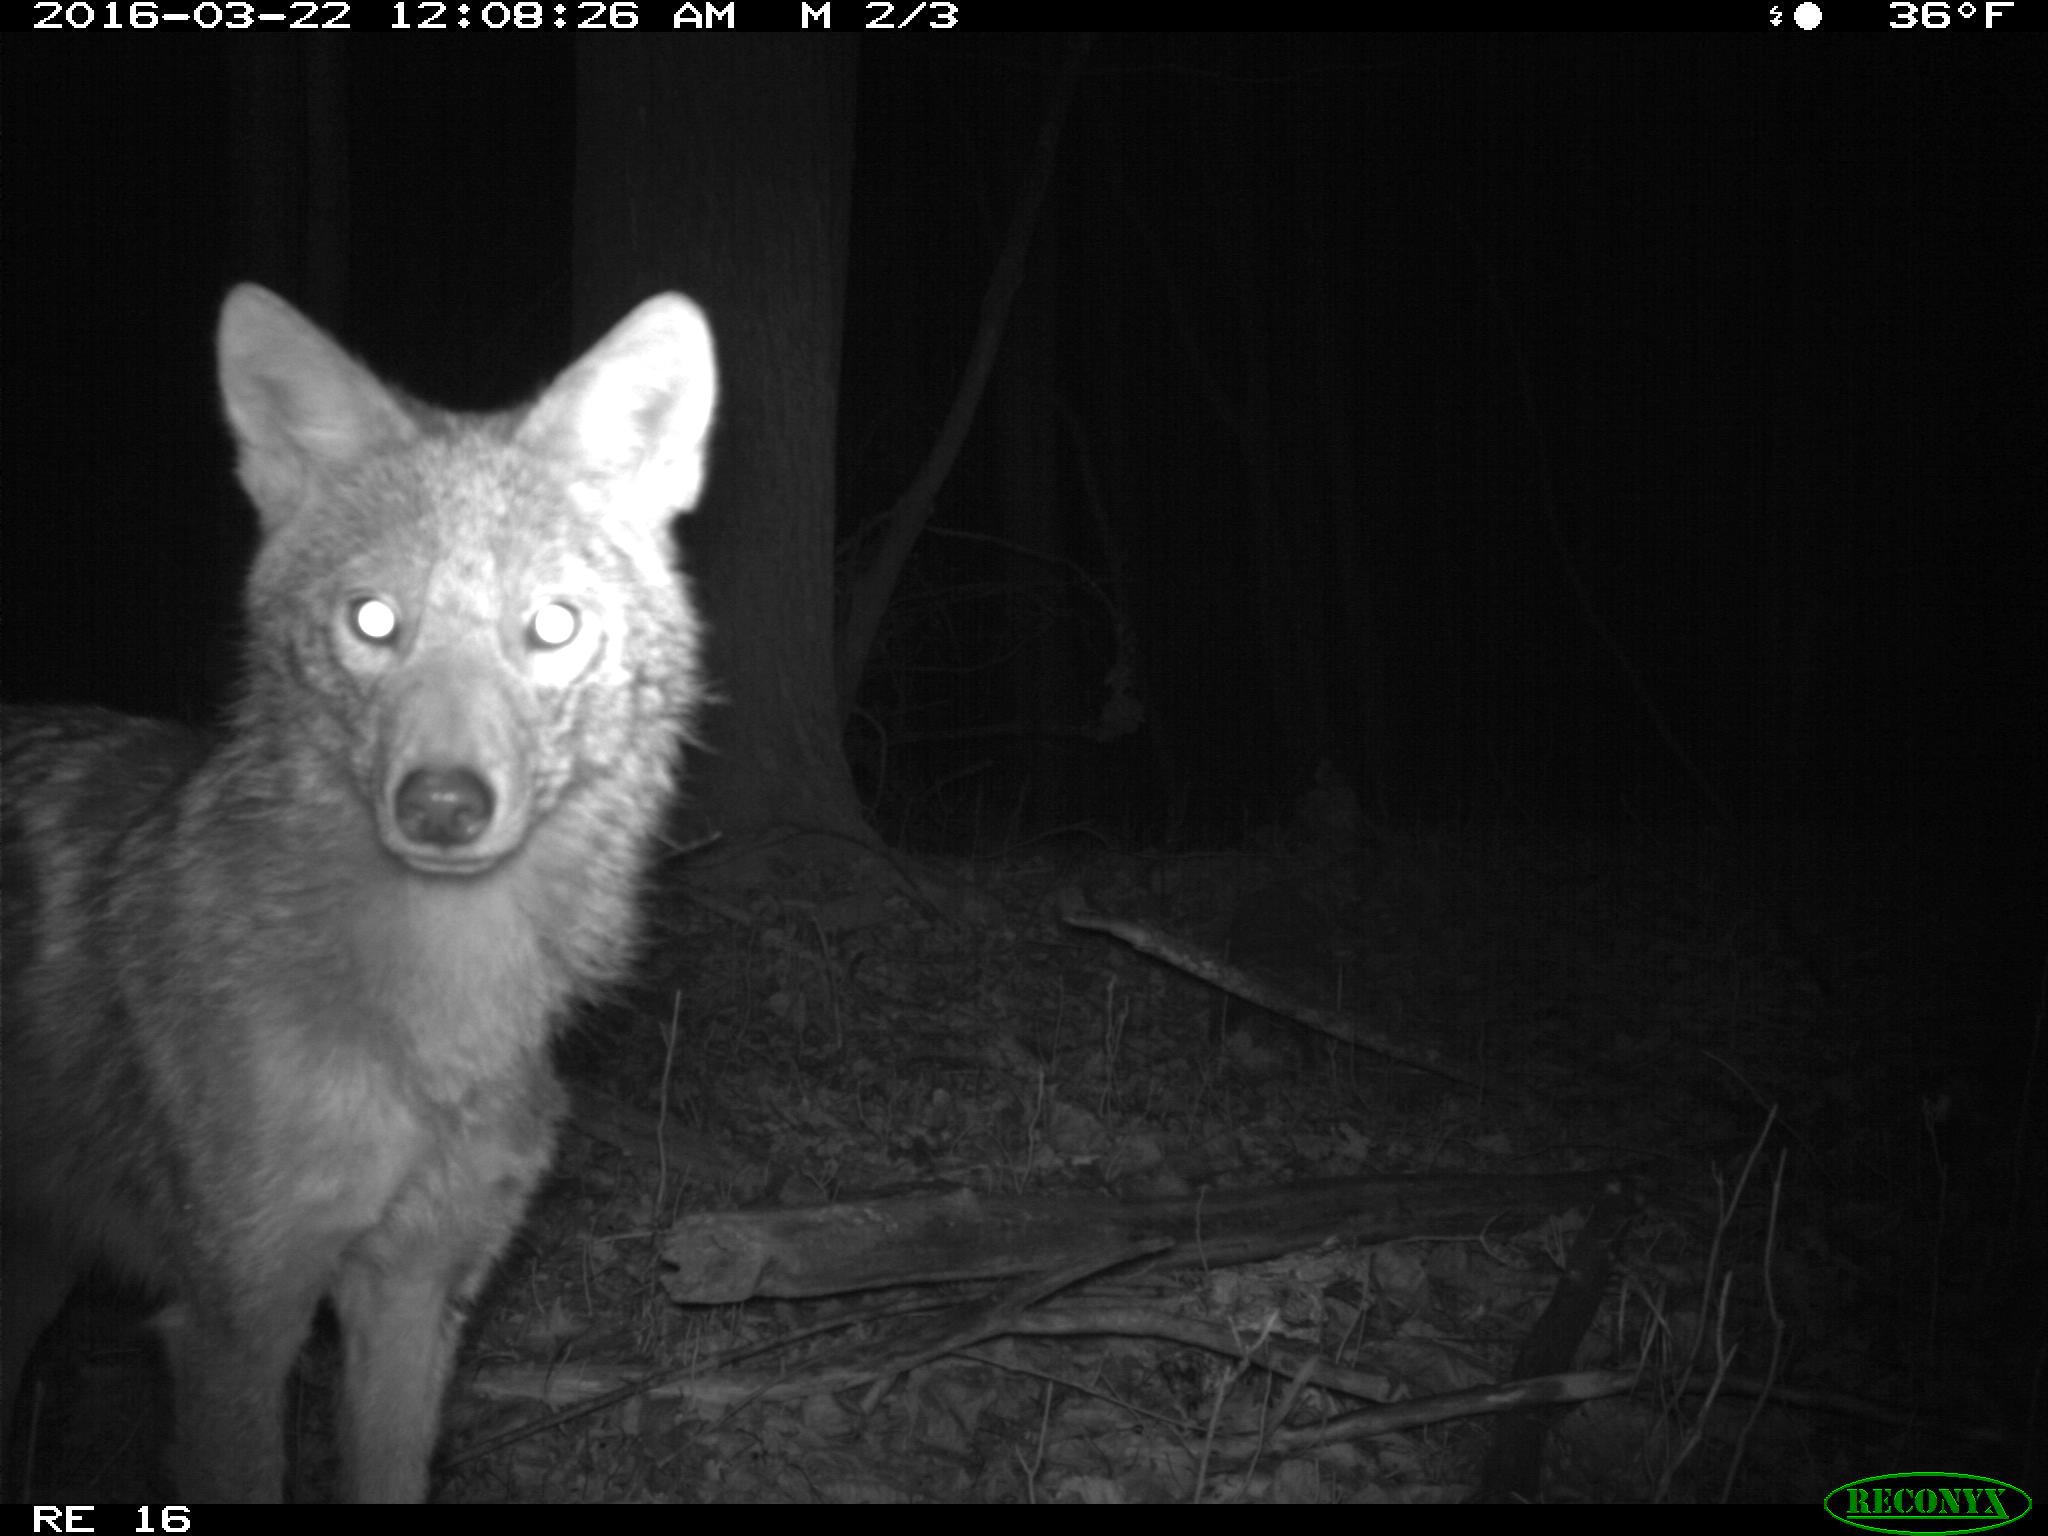 Nighttime photo of a coyote at the Shiawassee National Wildlife Refuge near Saginaw. Image credit: U-M Applied Wildlife Ecology Lab.